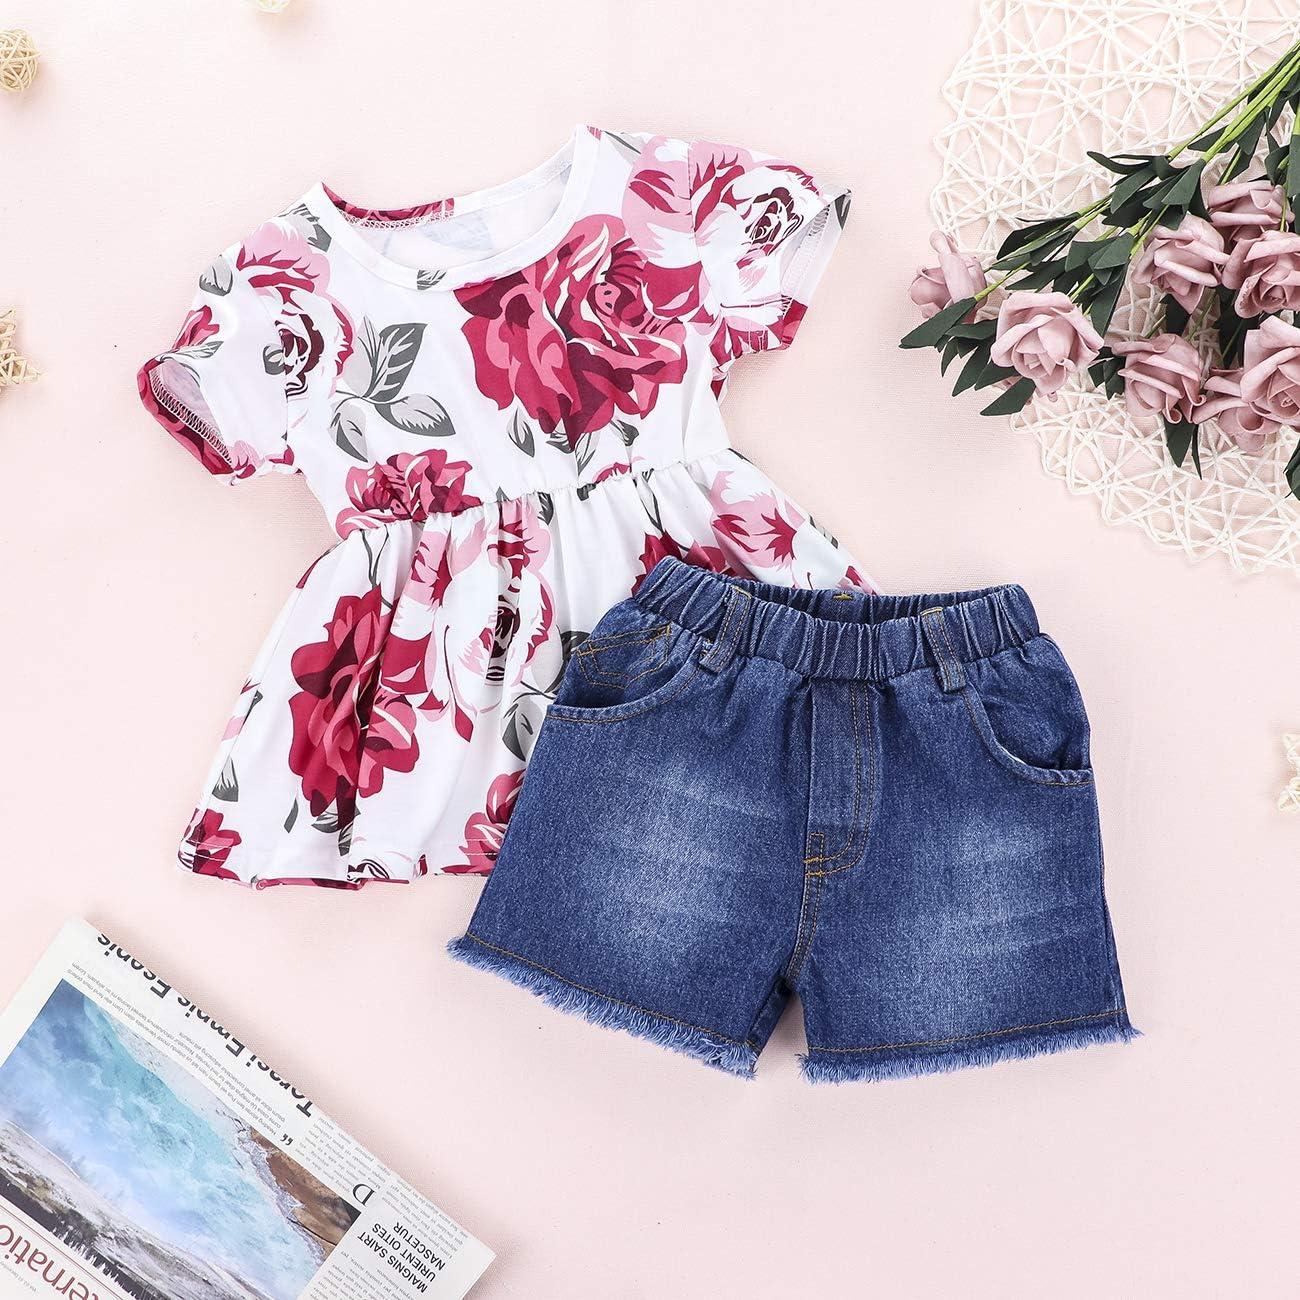 4th of July Toddler Baby girl clothes Outfit Sleeveless Short Sleeve + Shorts + Headband 3Pcs